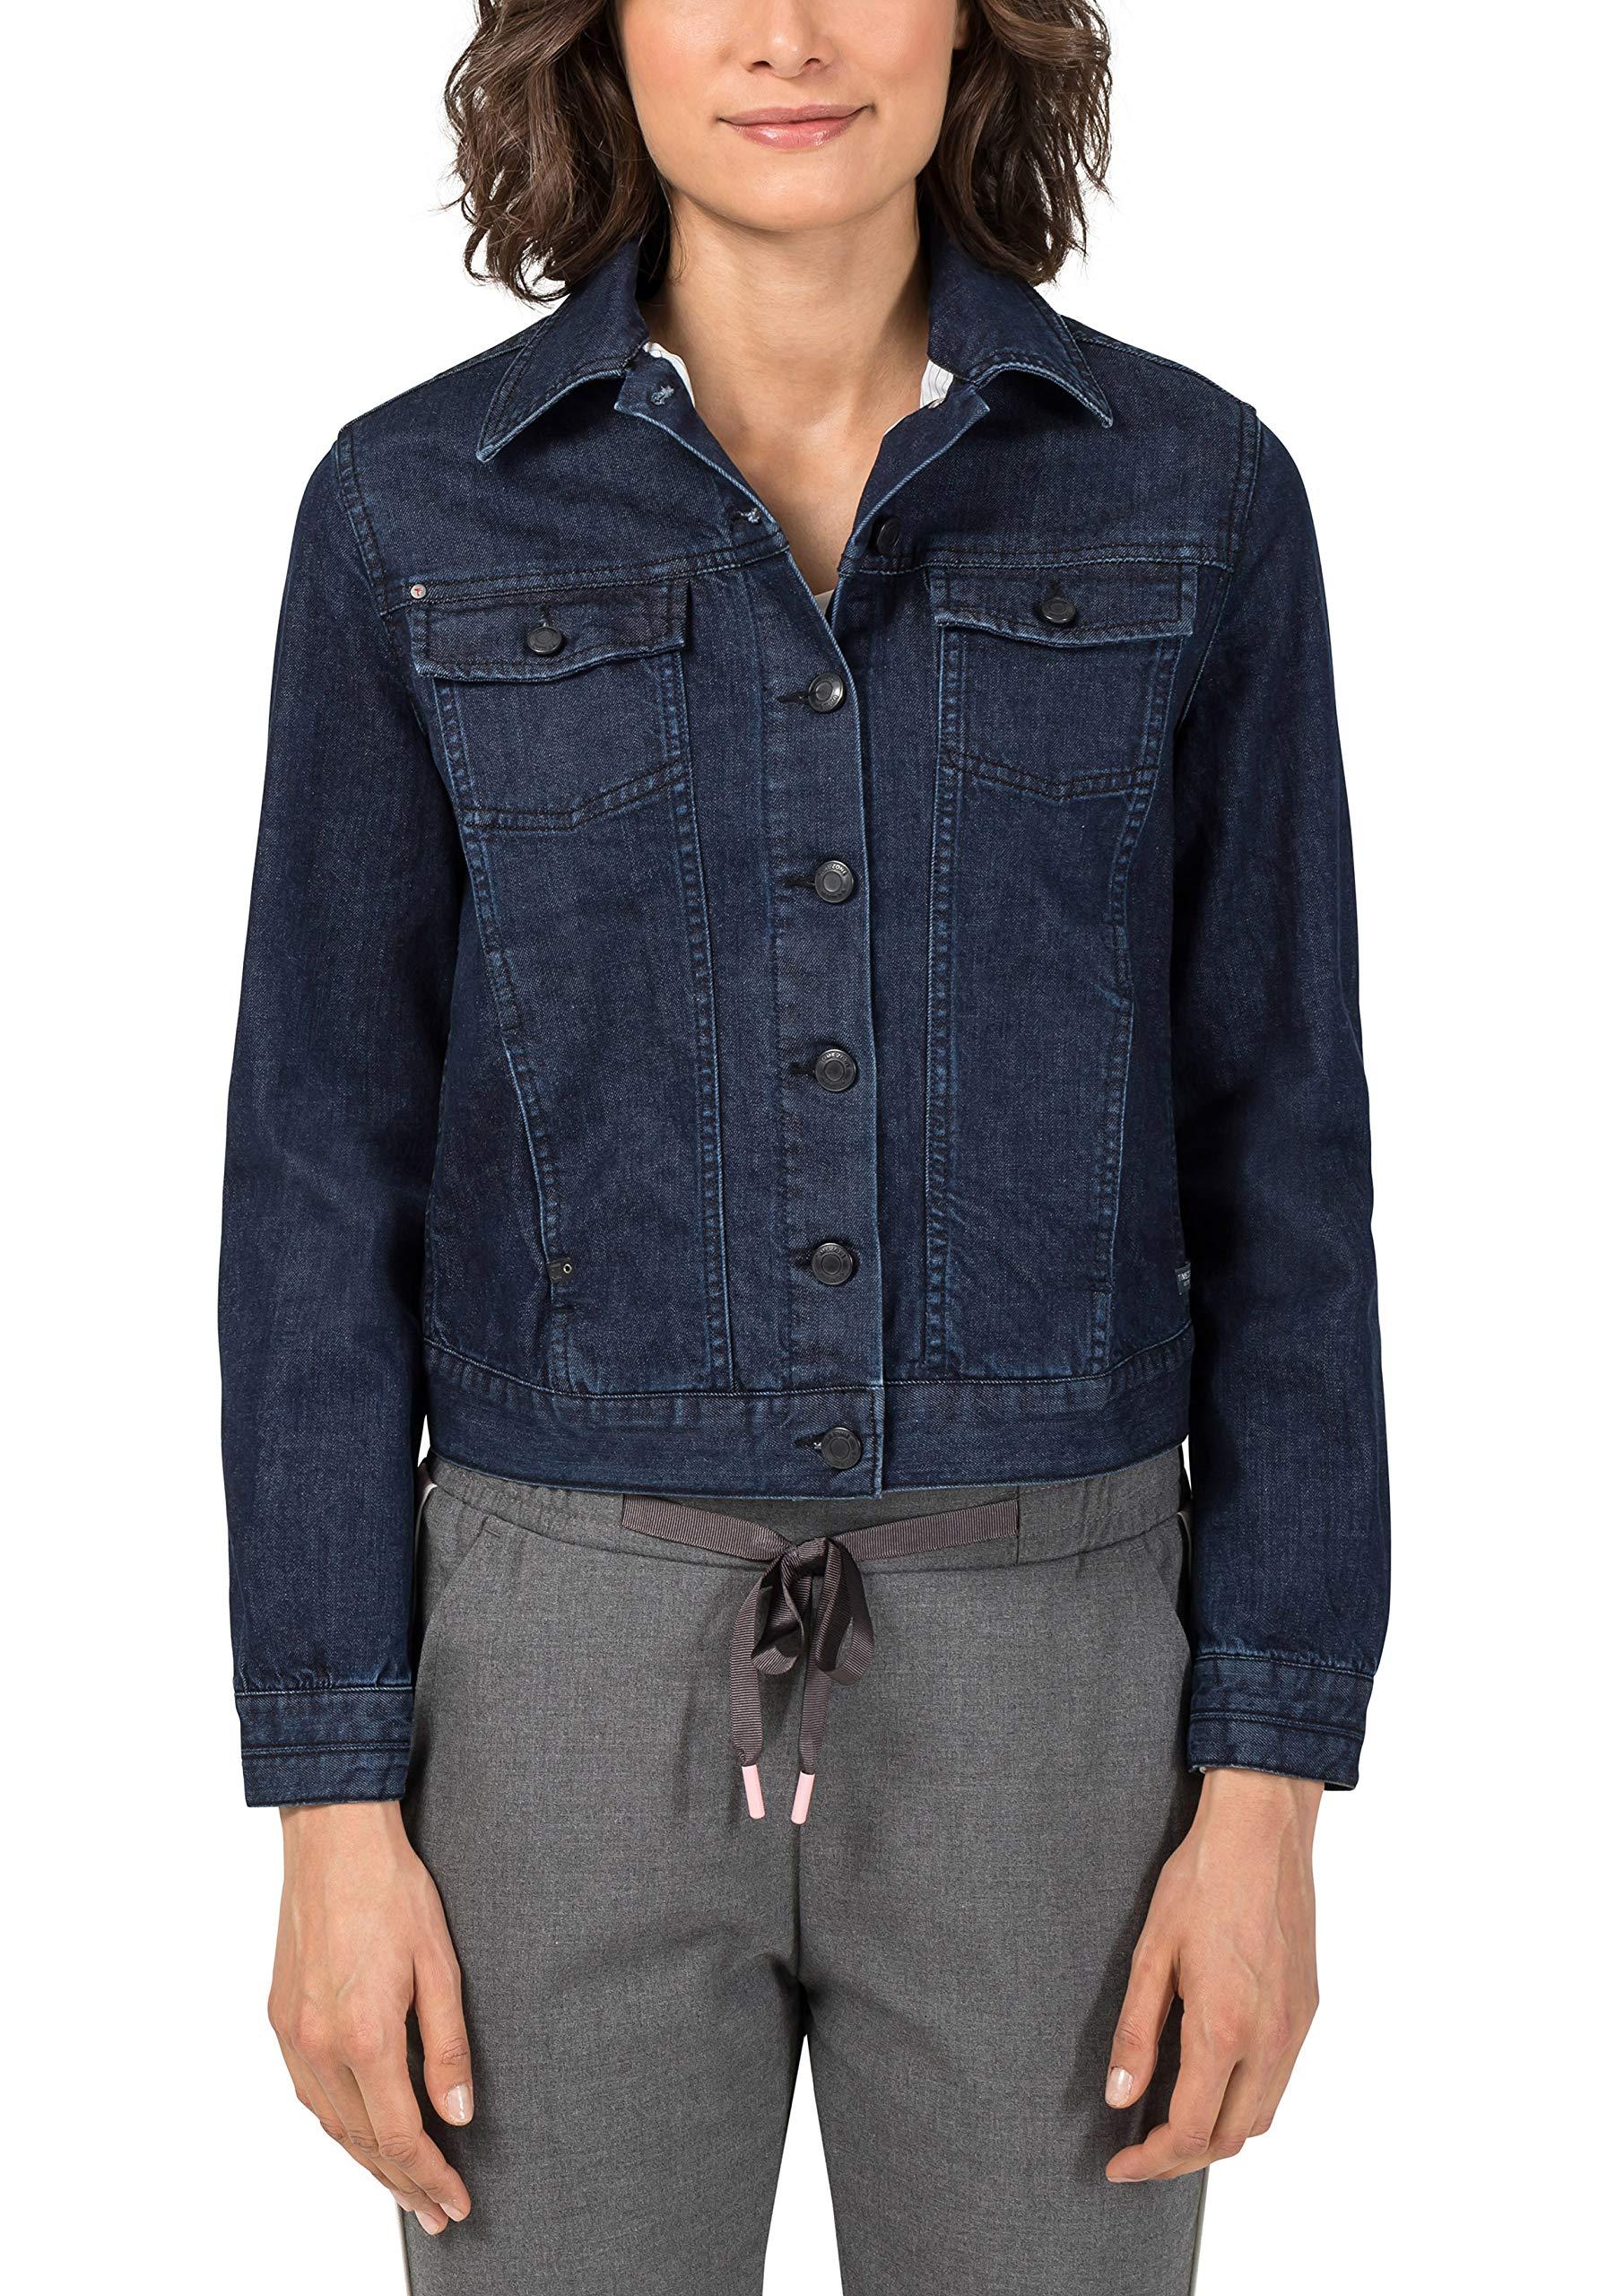 Blue JeanBleunight En Timezone Brushed FabricantX Jacket Wash smallFemme Denim Veste 342534taille KJT3ulF1c